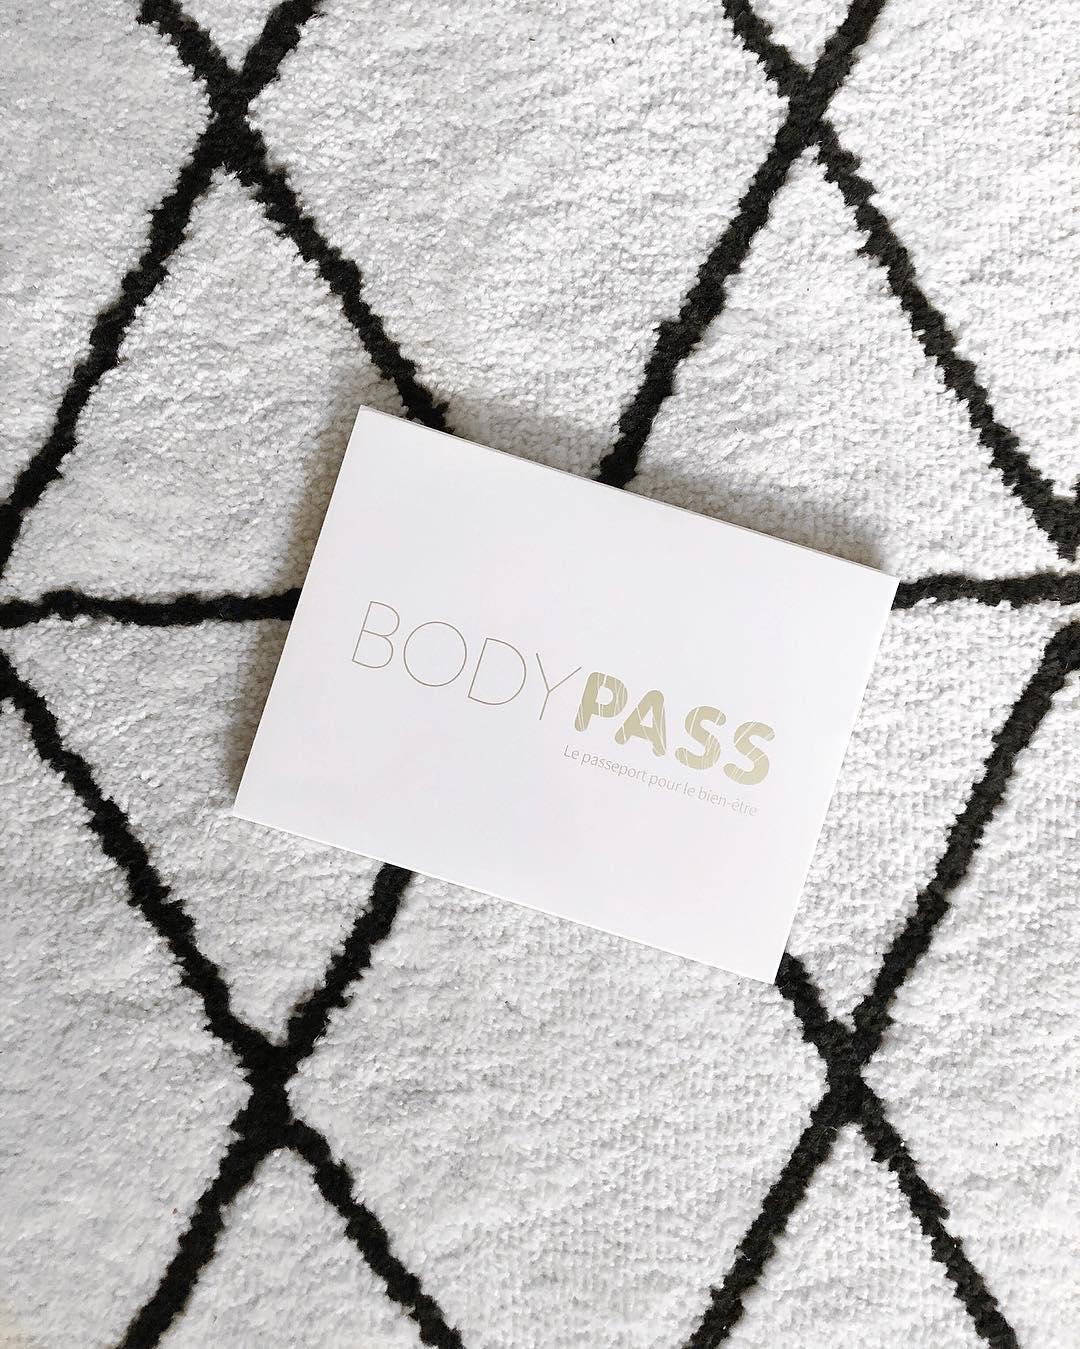 Bodypass 2018